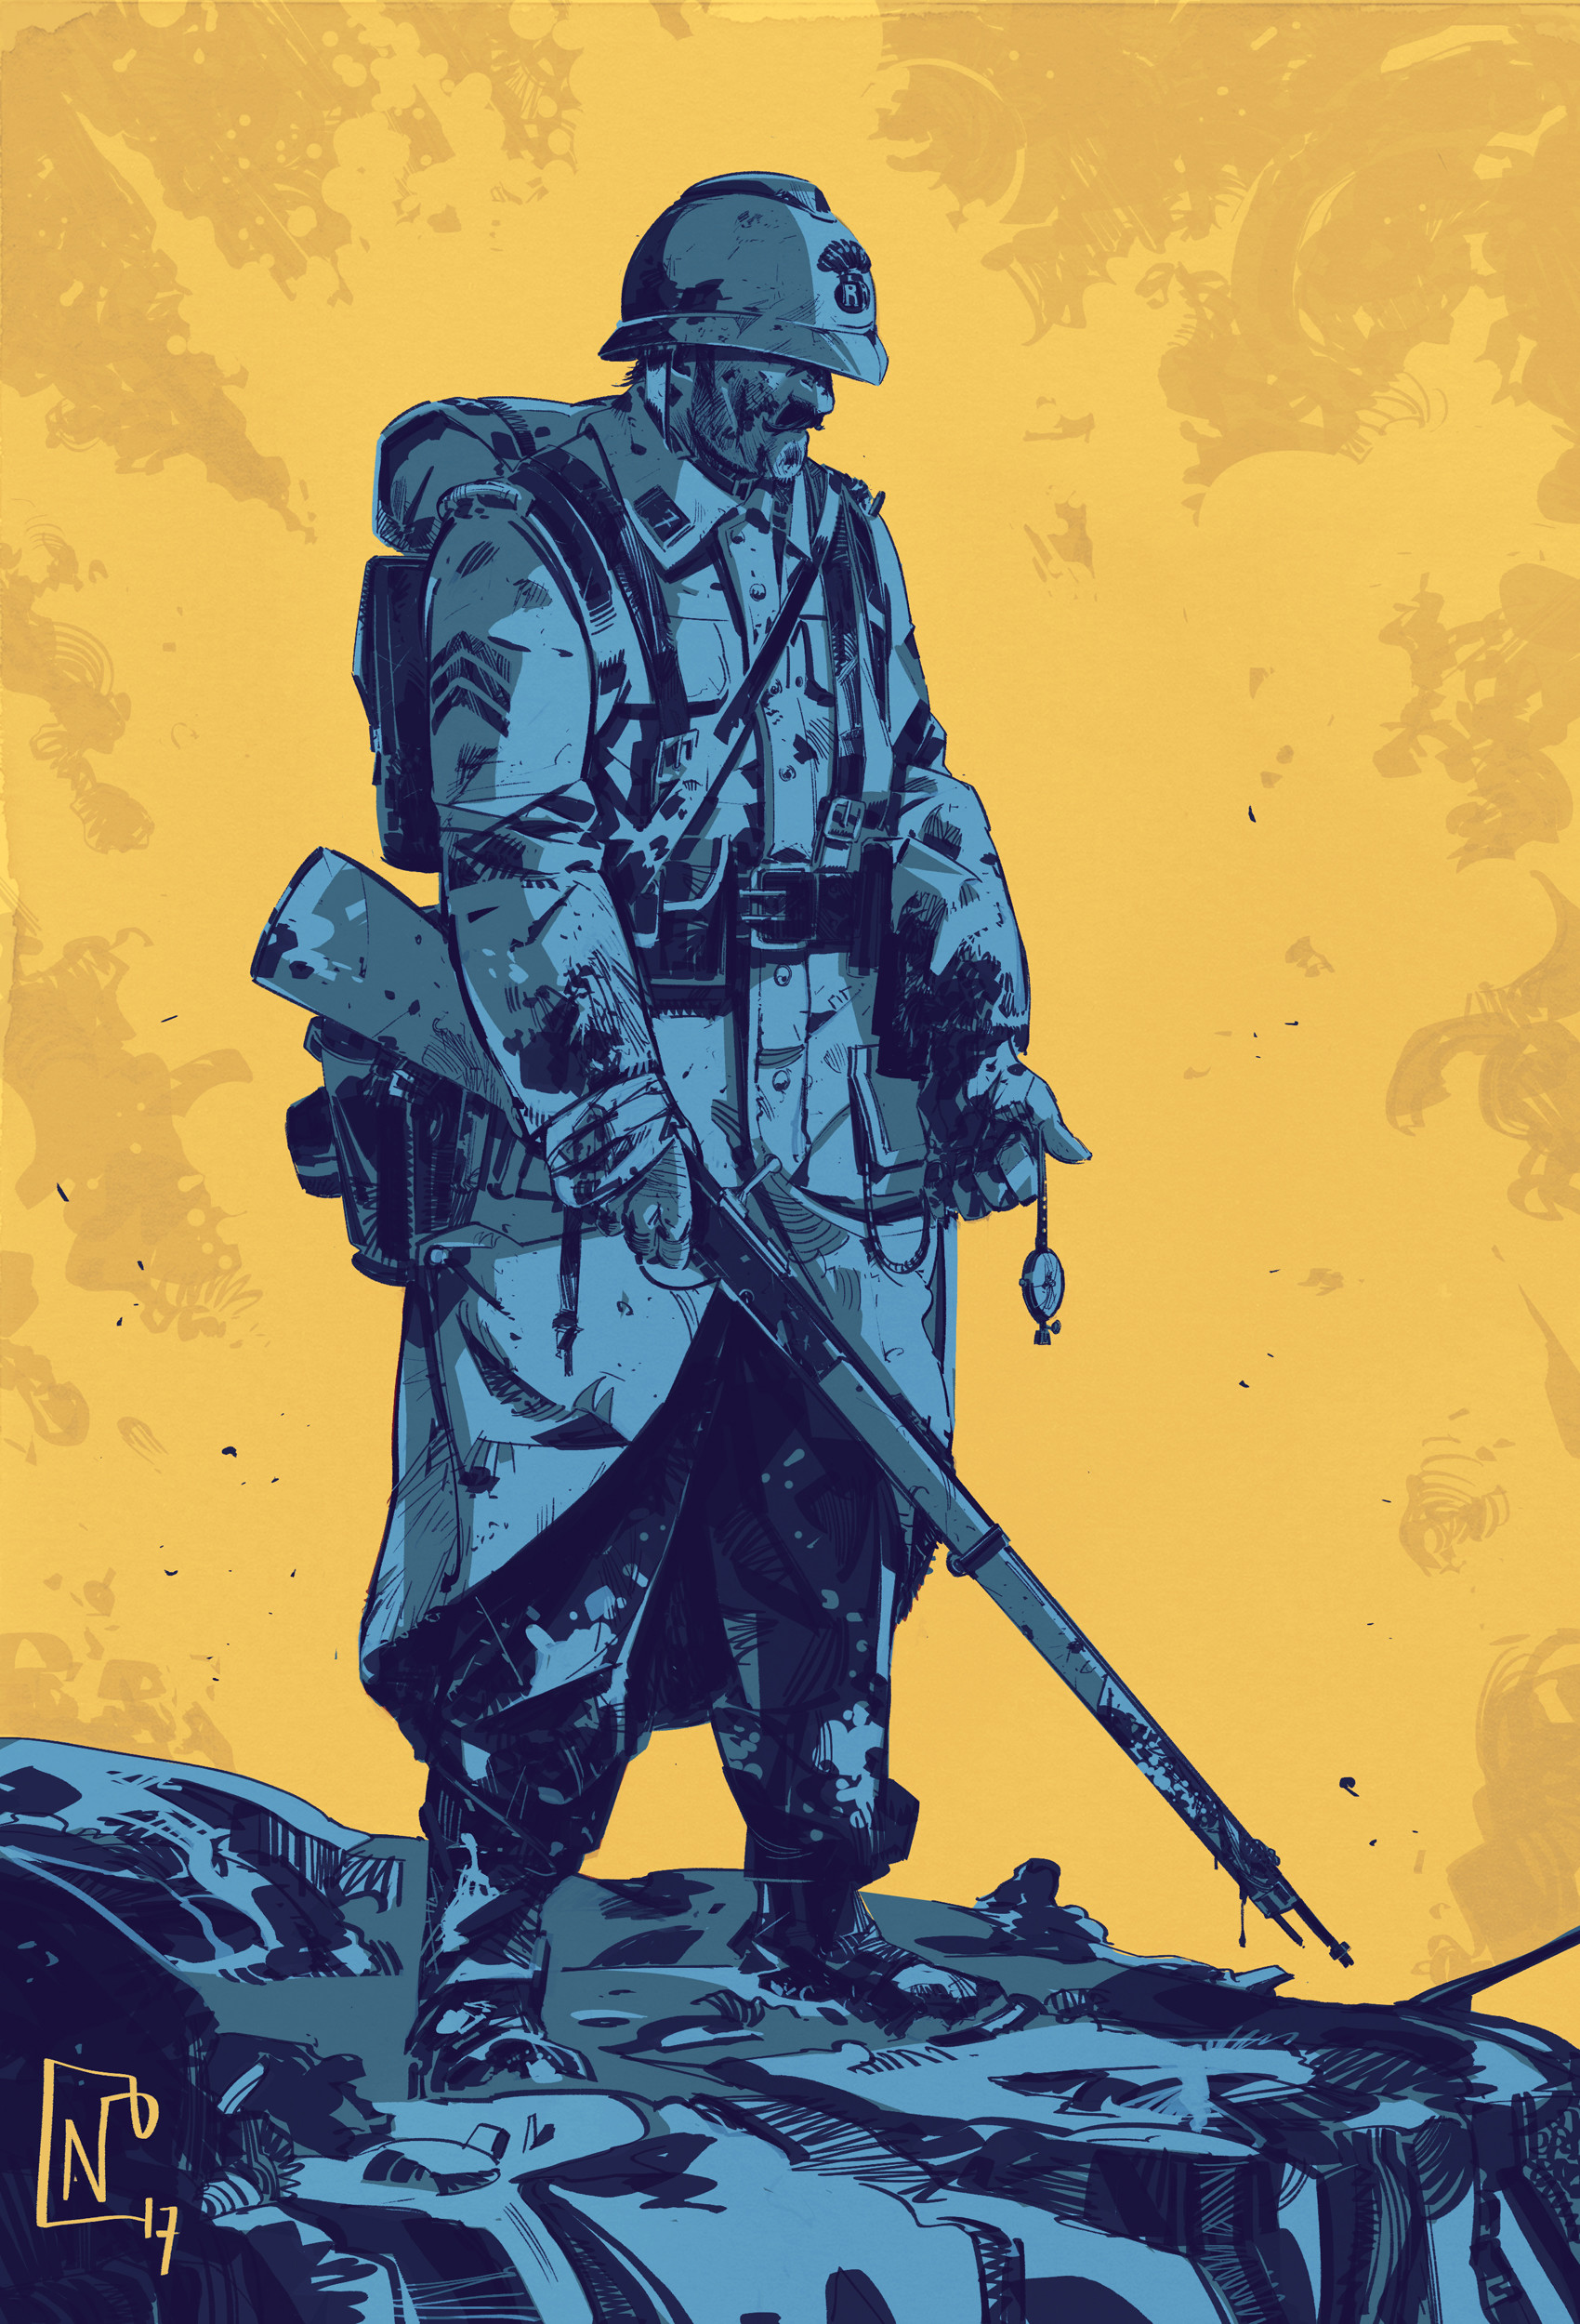 Nicolas petrimaux ww1 soldier 10